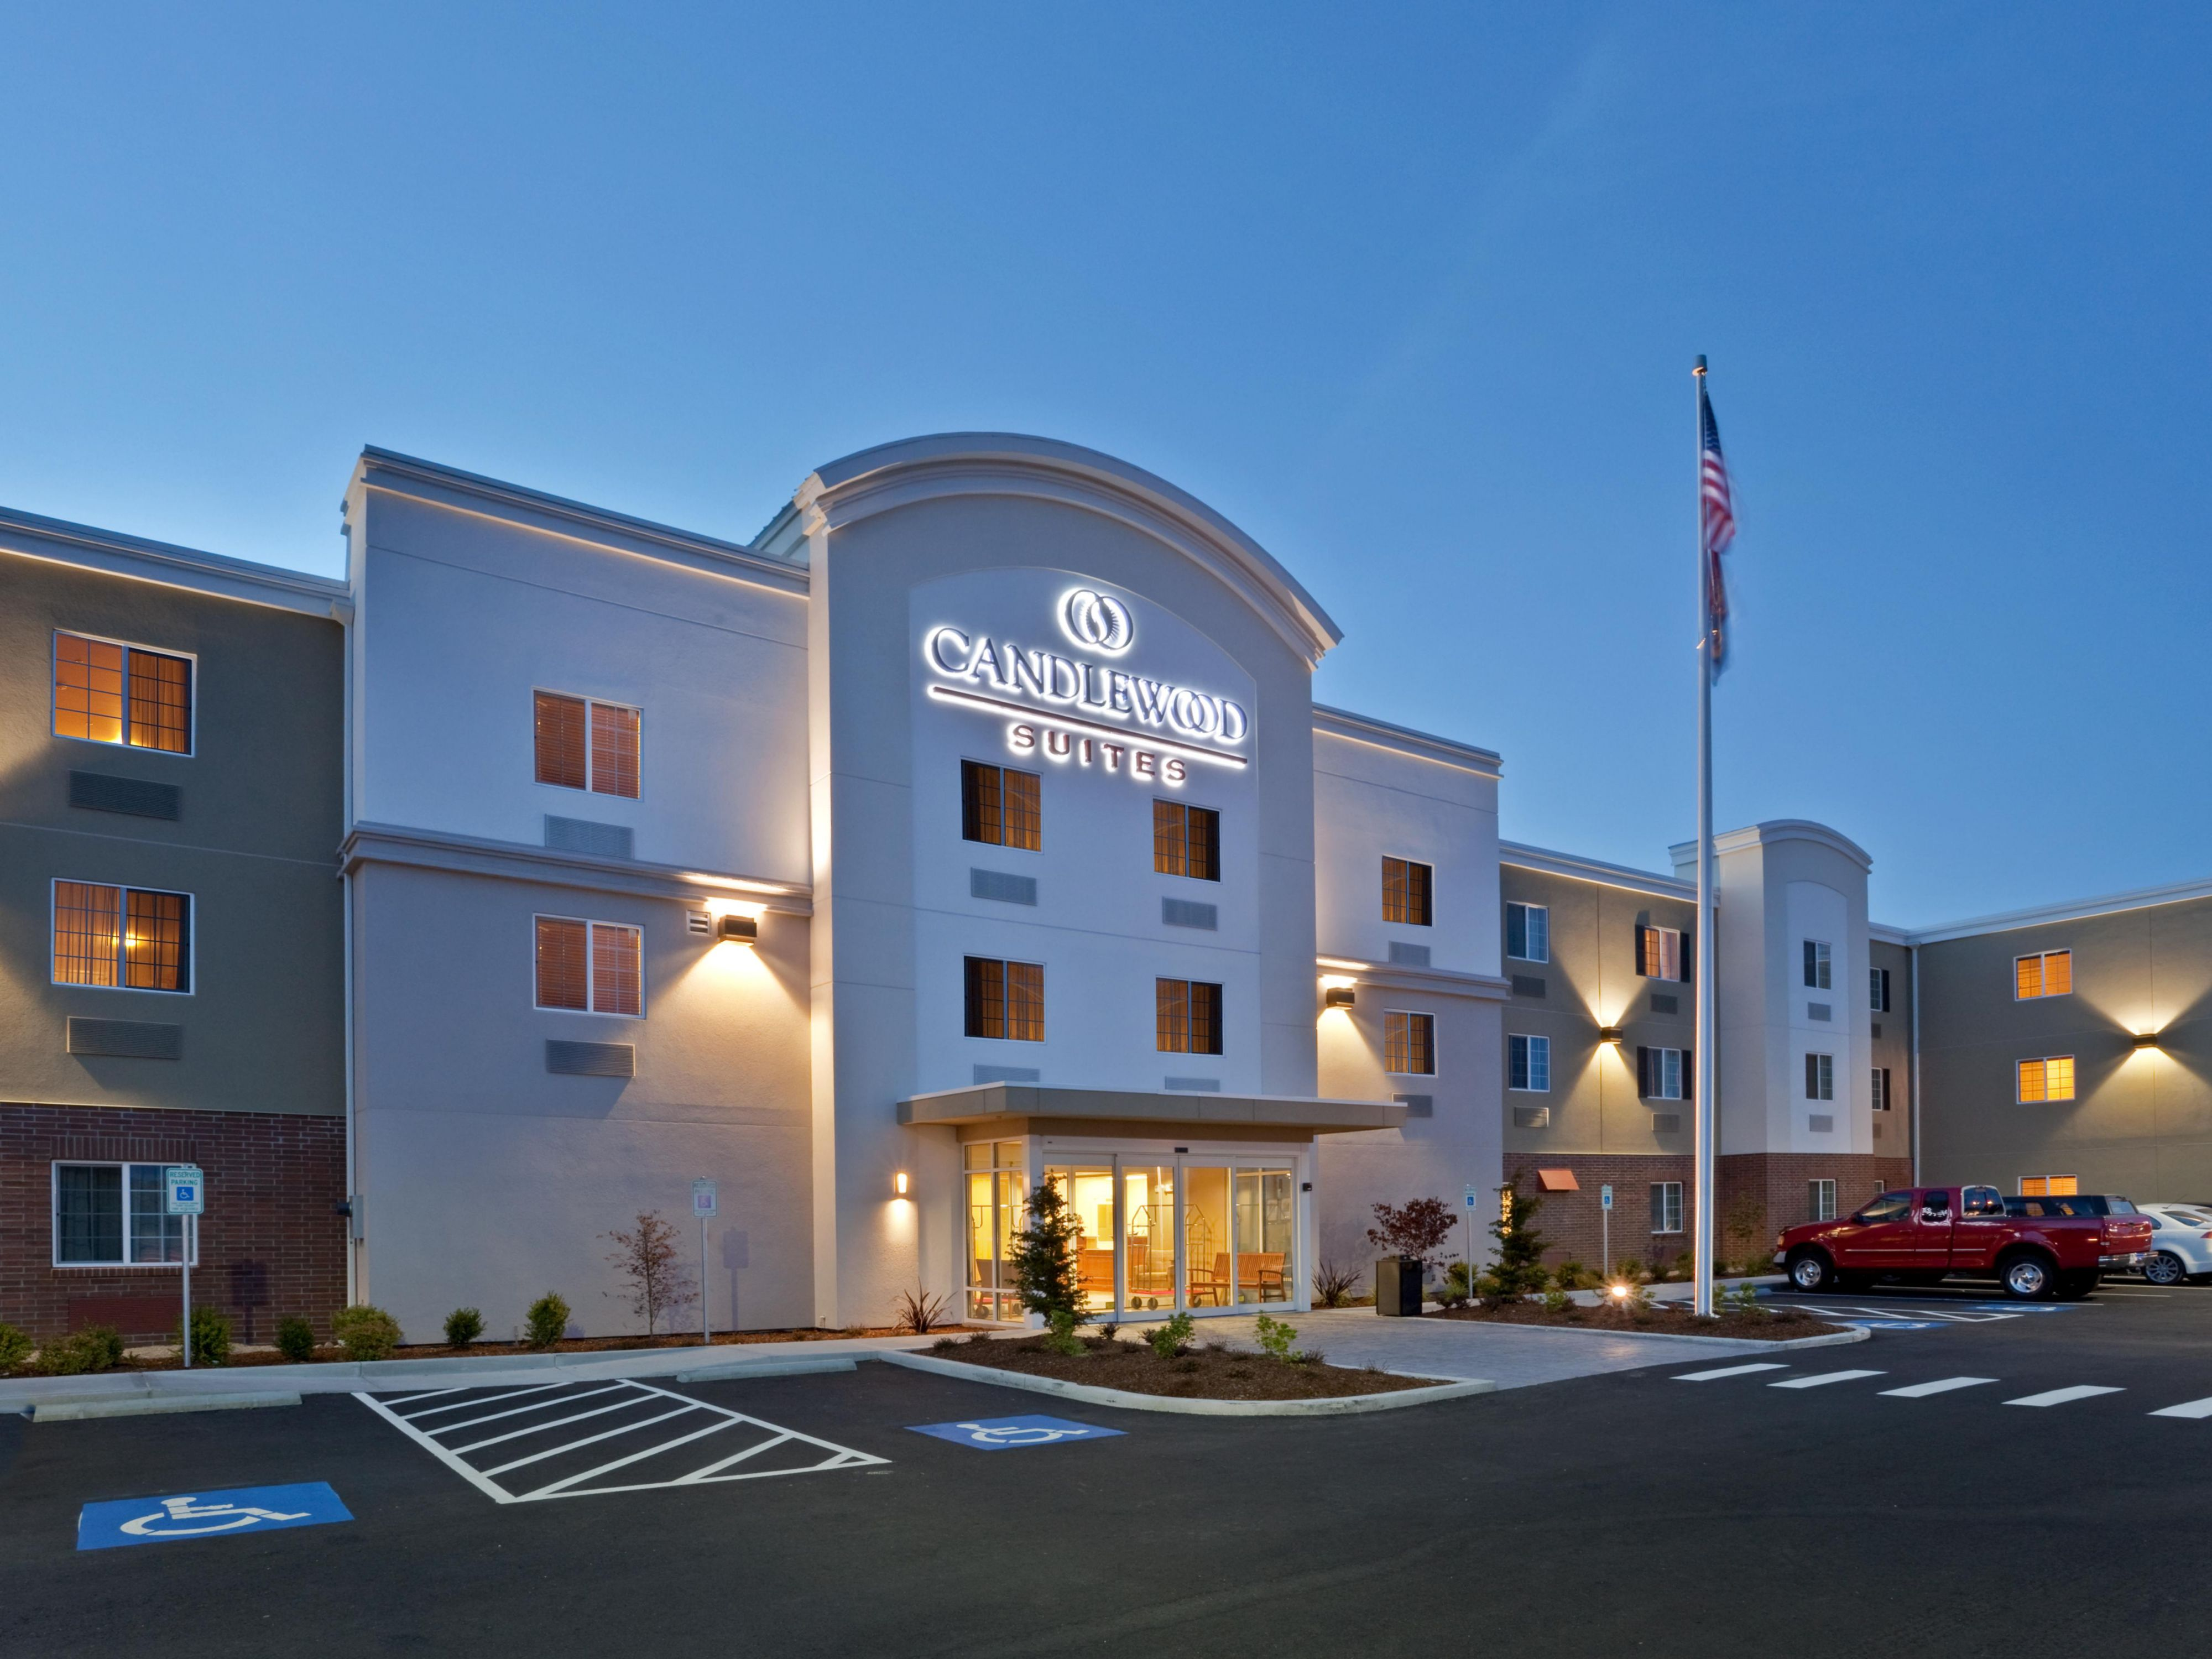 Lakewood Hotels Candlewood Suites Lakewood Extended